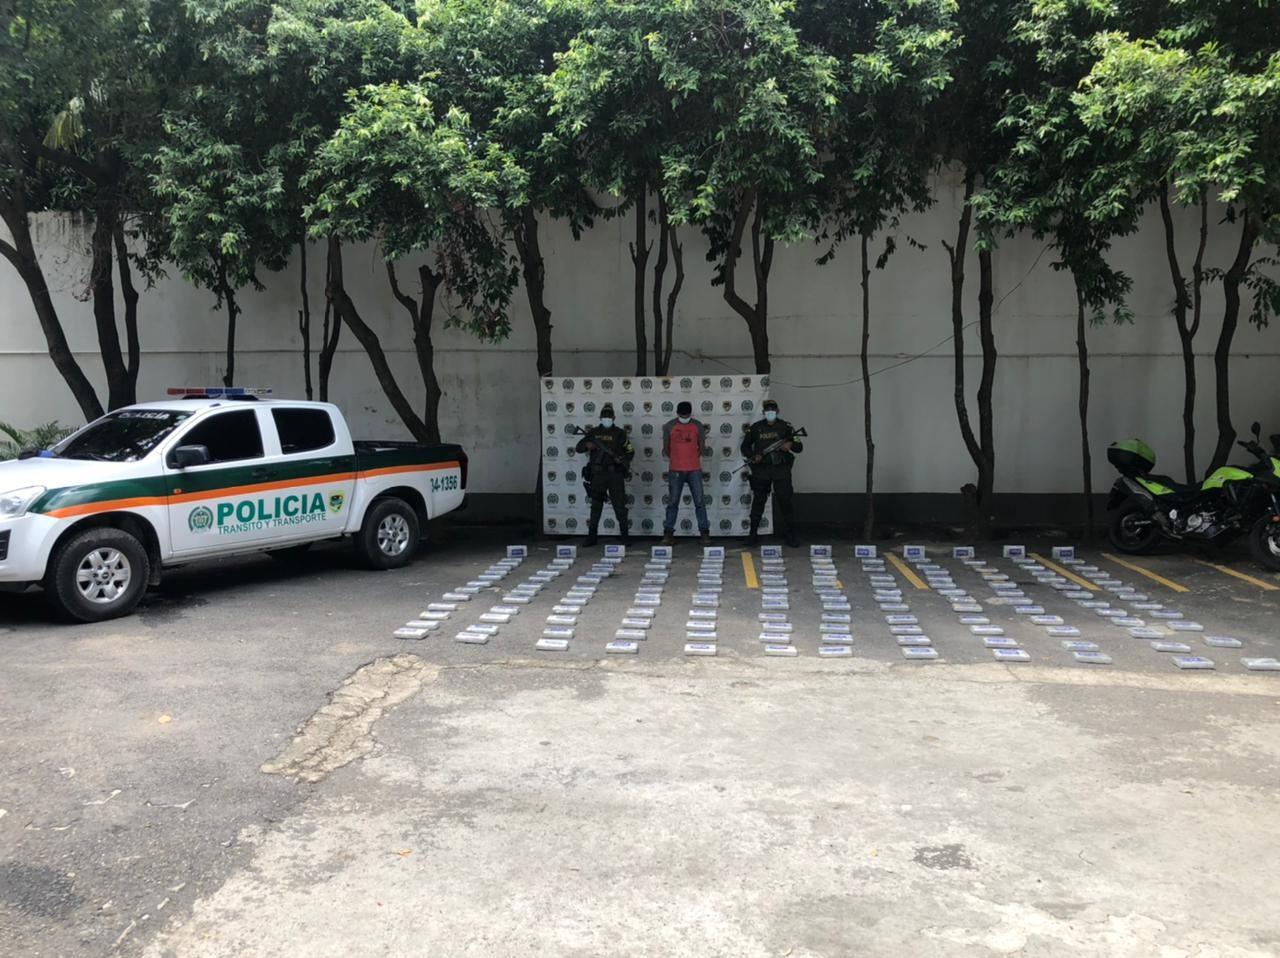 https://www.notasrosas.com/Setra incauta 150 mil gramos de Clorhidrato de Cocaína en la vía Aguaclara - Ocaña